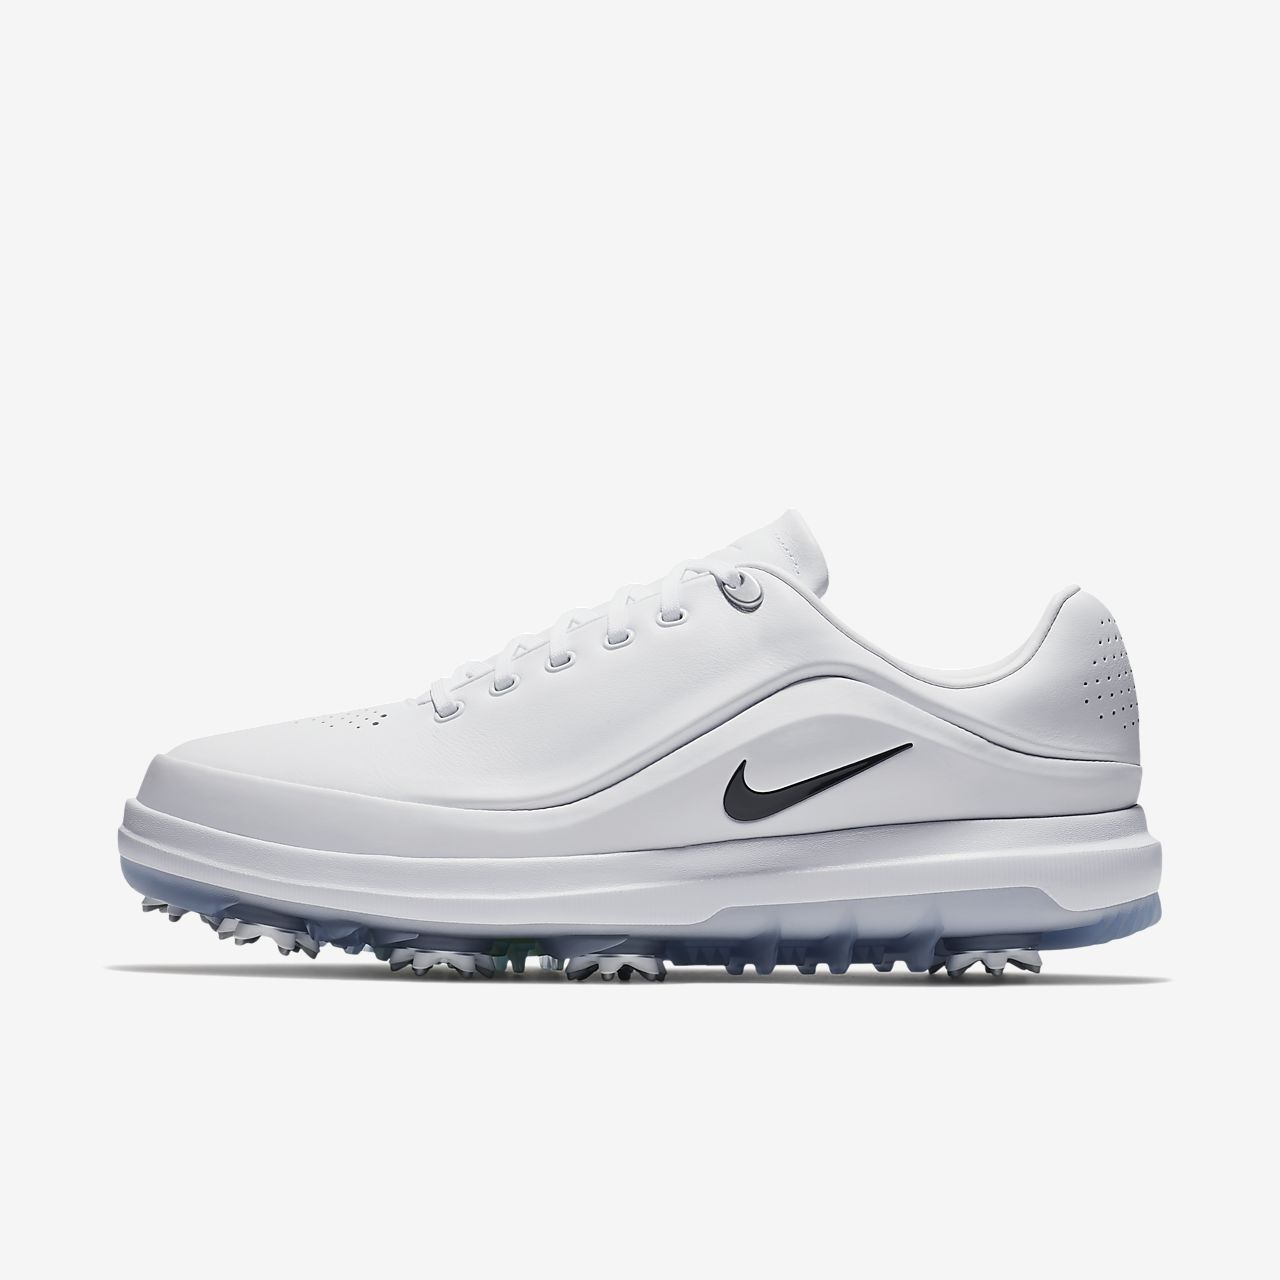 d86a23482cacd Nike Air Zoom Precision Zapatillas de golf - Hombre. Nike.com ES